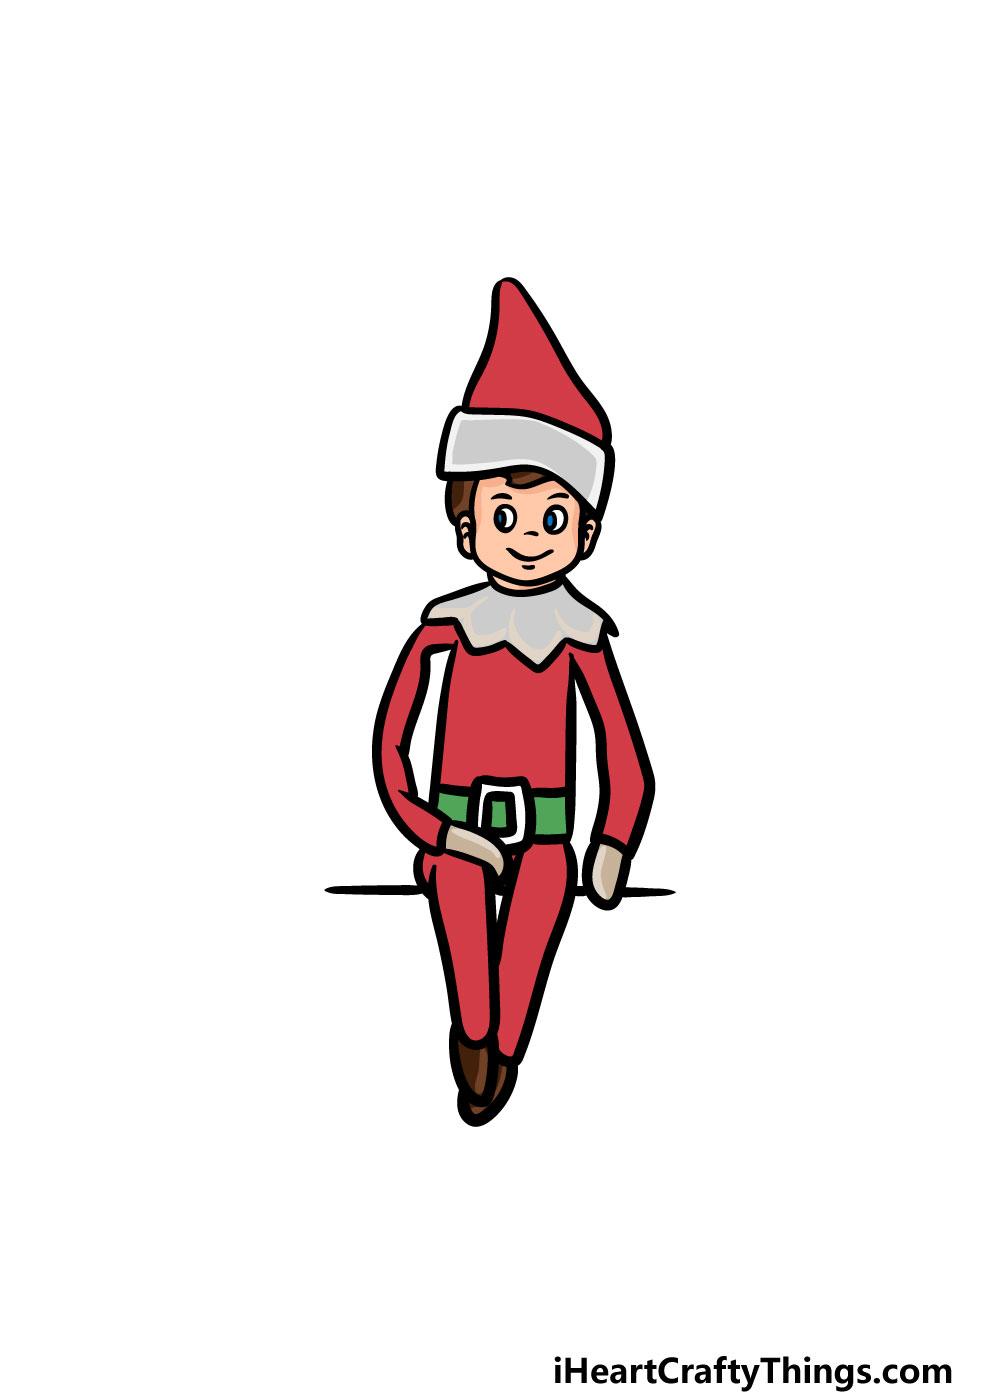 drawing an elf on a shelf step 6